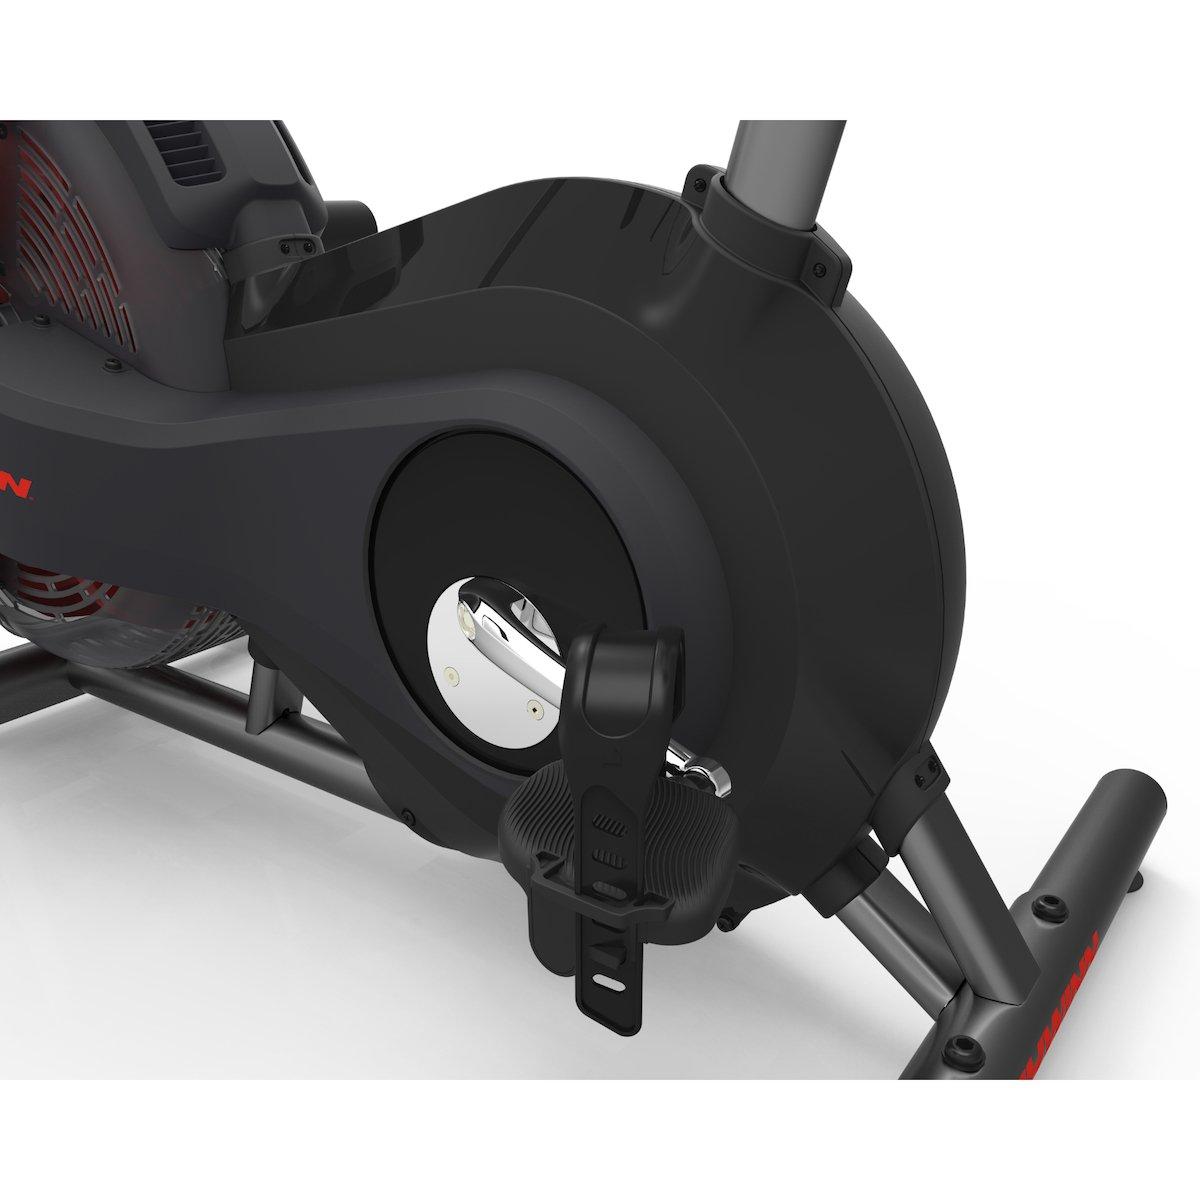 Bicicleta Fija de Resistencia Airdyne Ad2 - Spinning